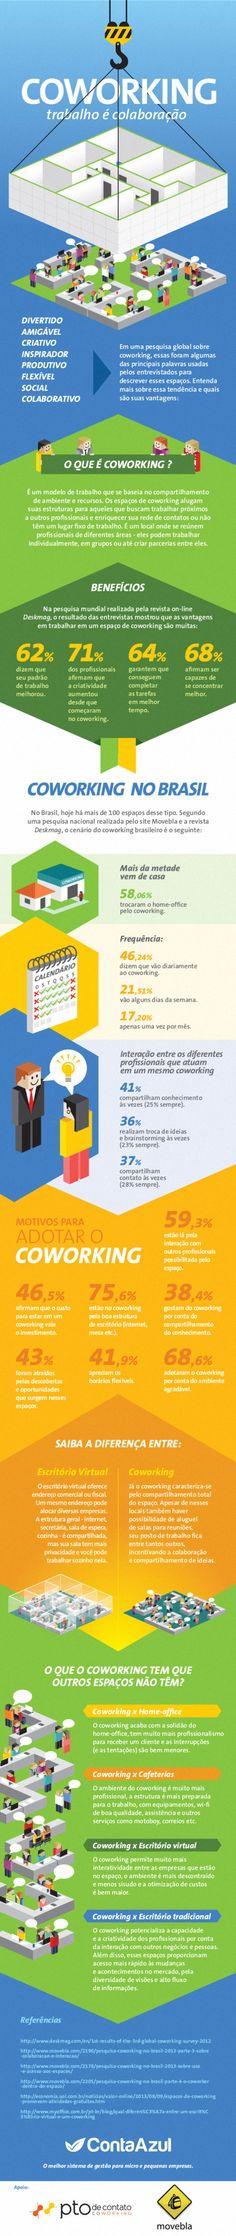 Infográfico sobre coworking